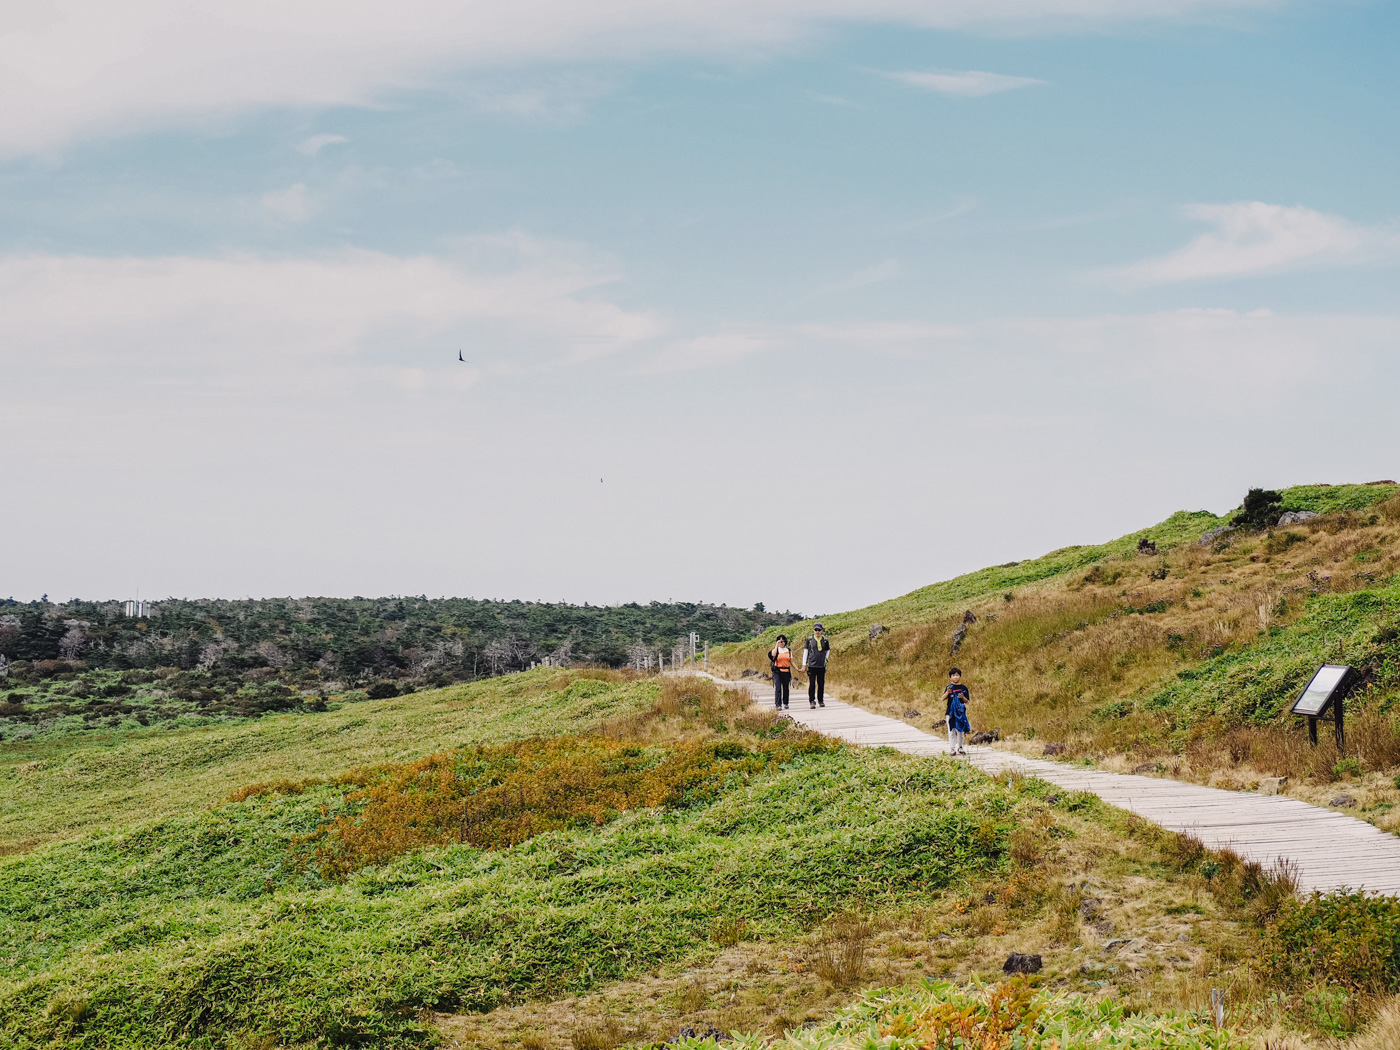 Korea - Mt Hallasan - Family hiking together